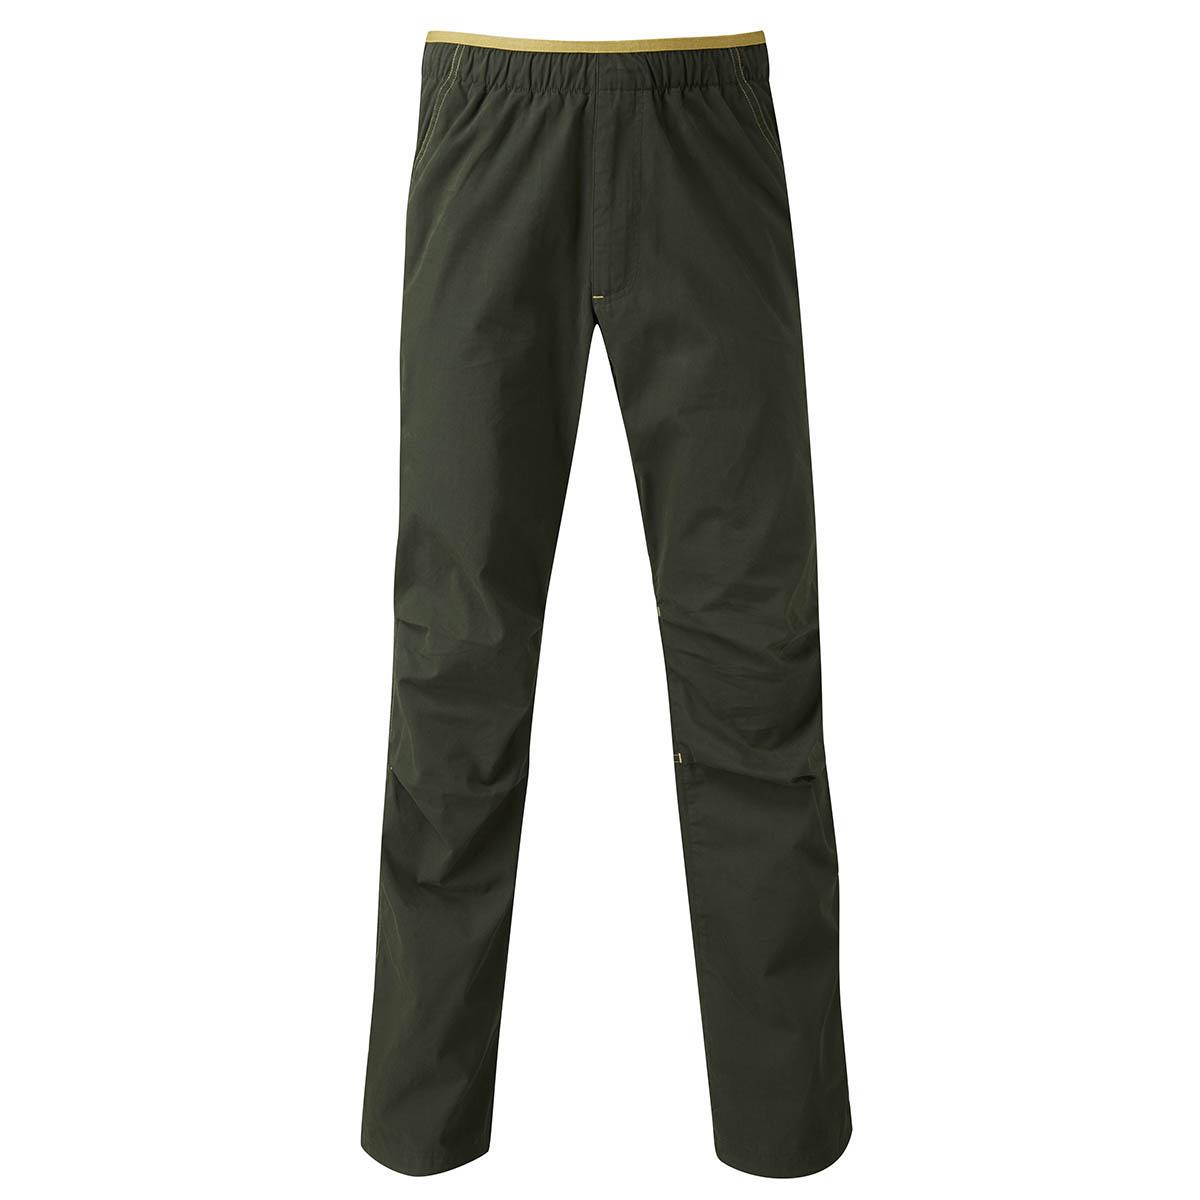 Rab Capstone Climbing Pants, climbing trousers, sumer climbing trousers,  buy rab clothing online